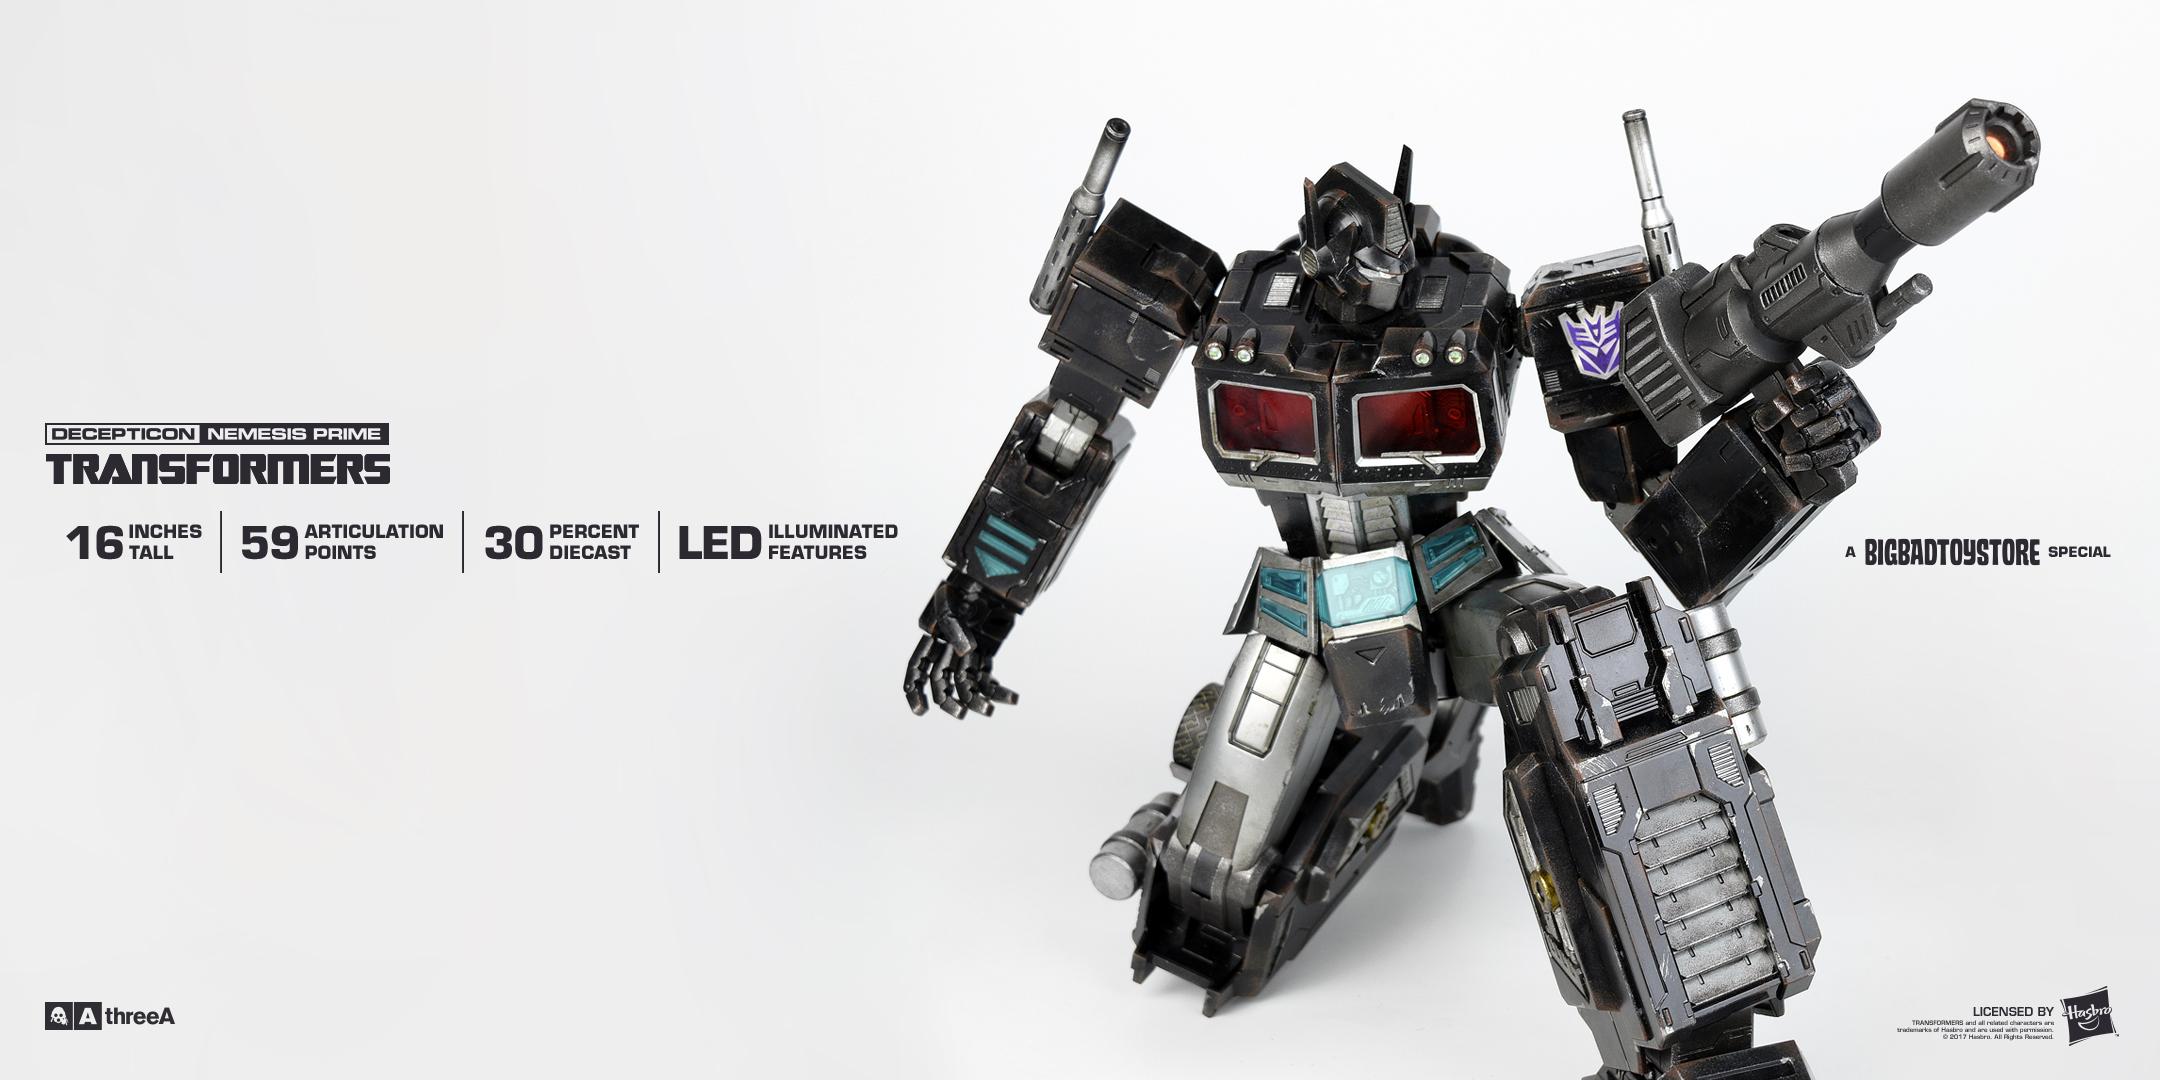 3A_Hasbro_Transformers_NemesisPrime_Landscape_v004.jpg